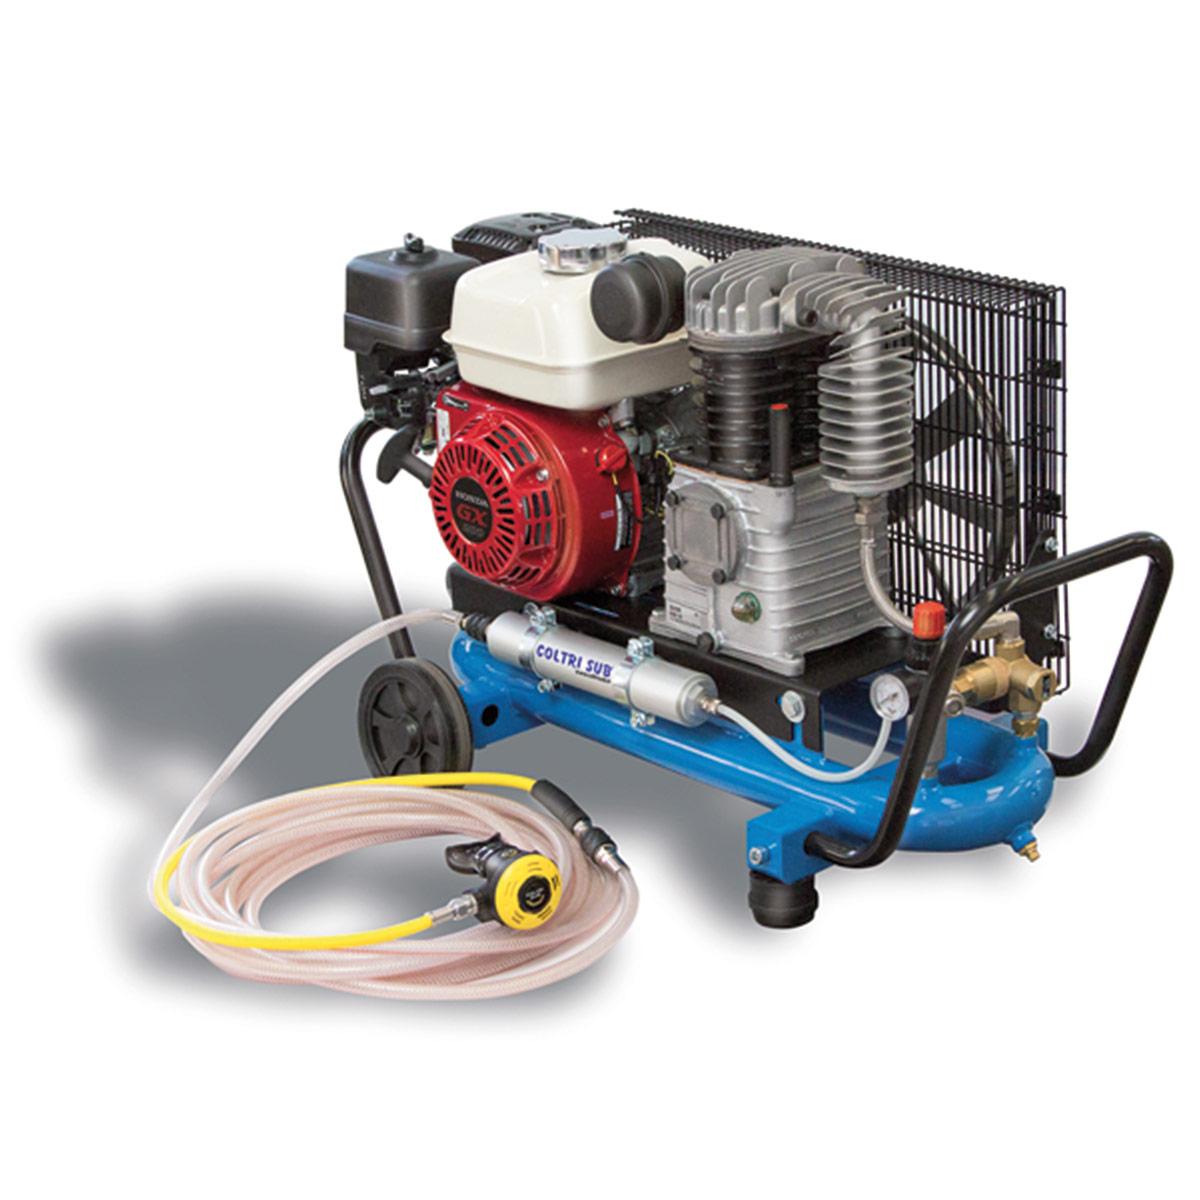 Бензинов водолазен компресор тип Наргеле ЕOLO 330 SH THIRD LUNG COMPRESSOR 8 бара / HONDA - Coltri